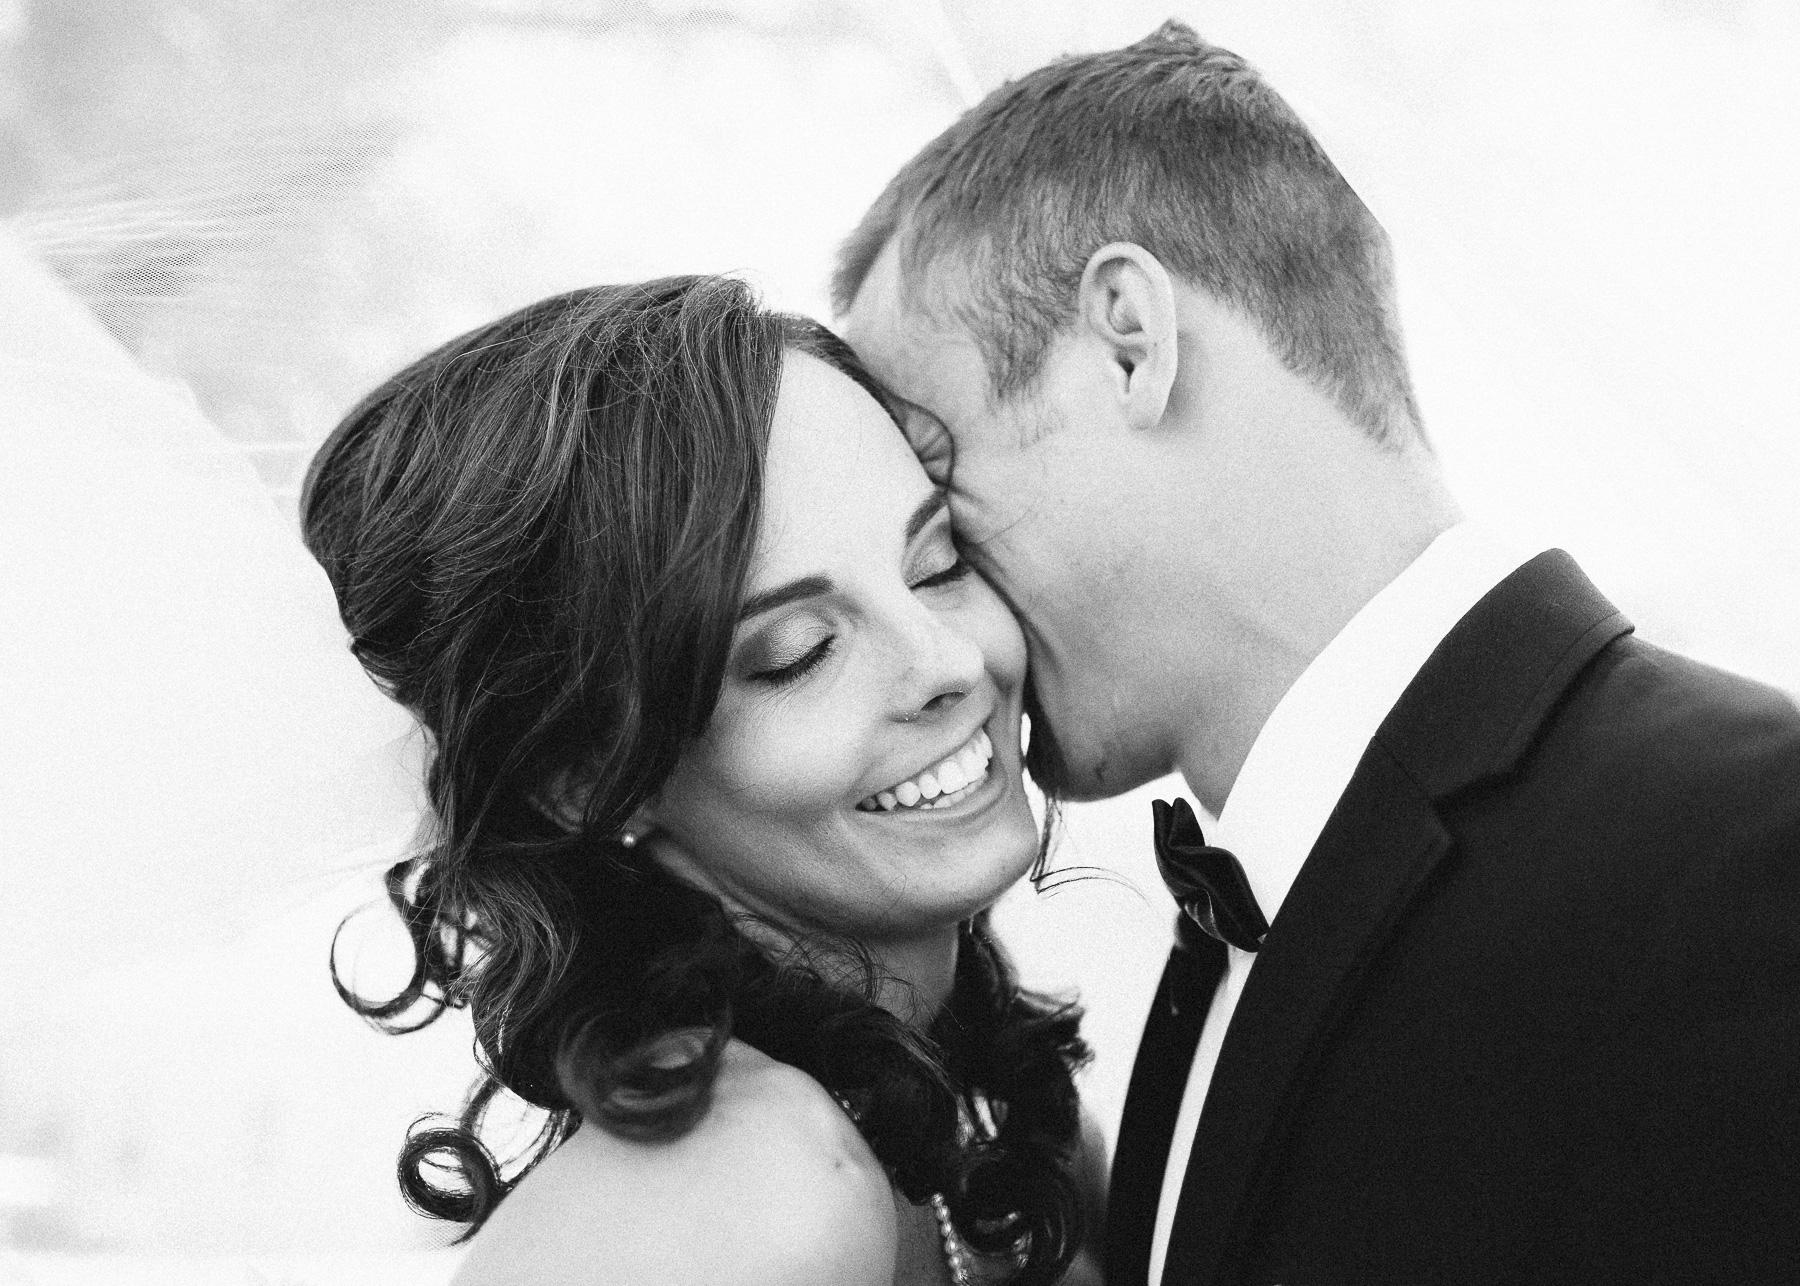 bride smiling underneath veil